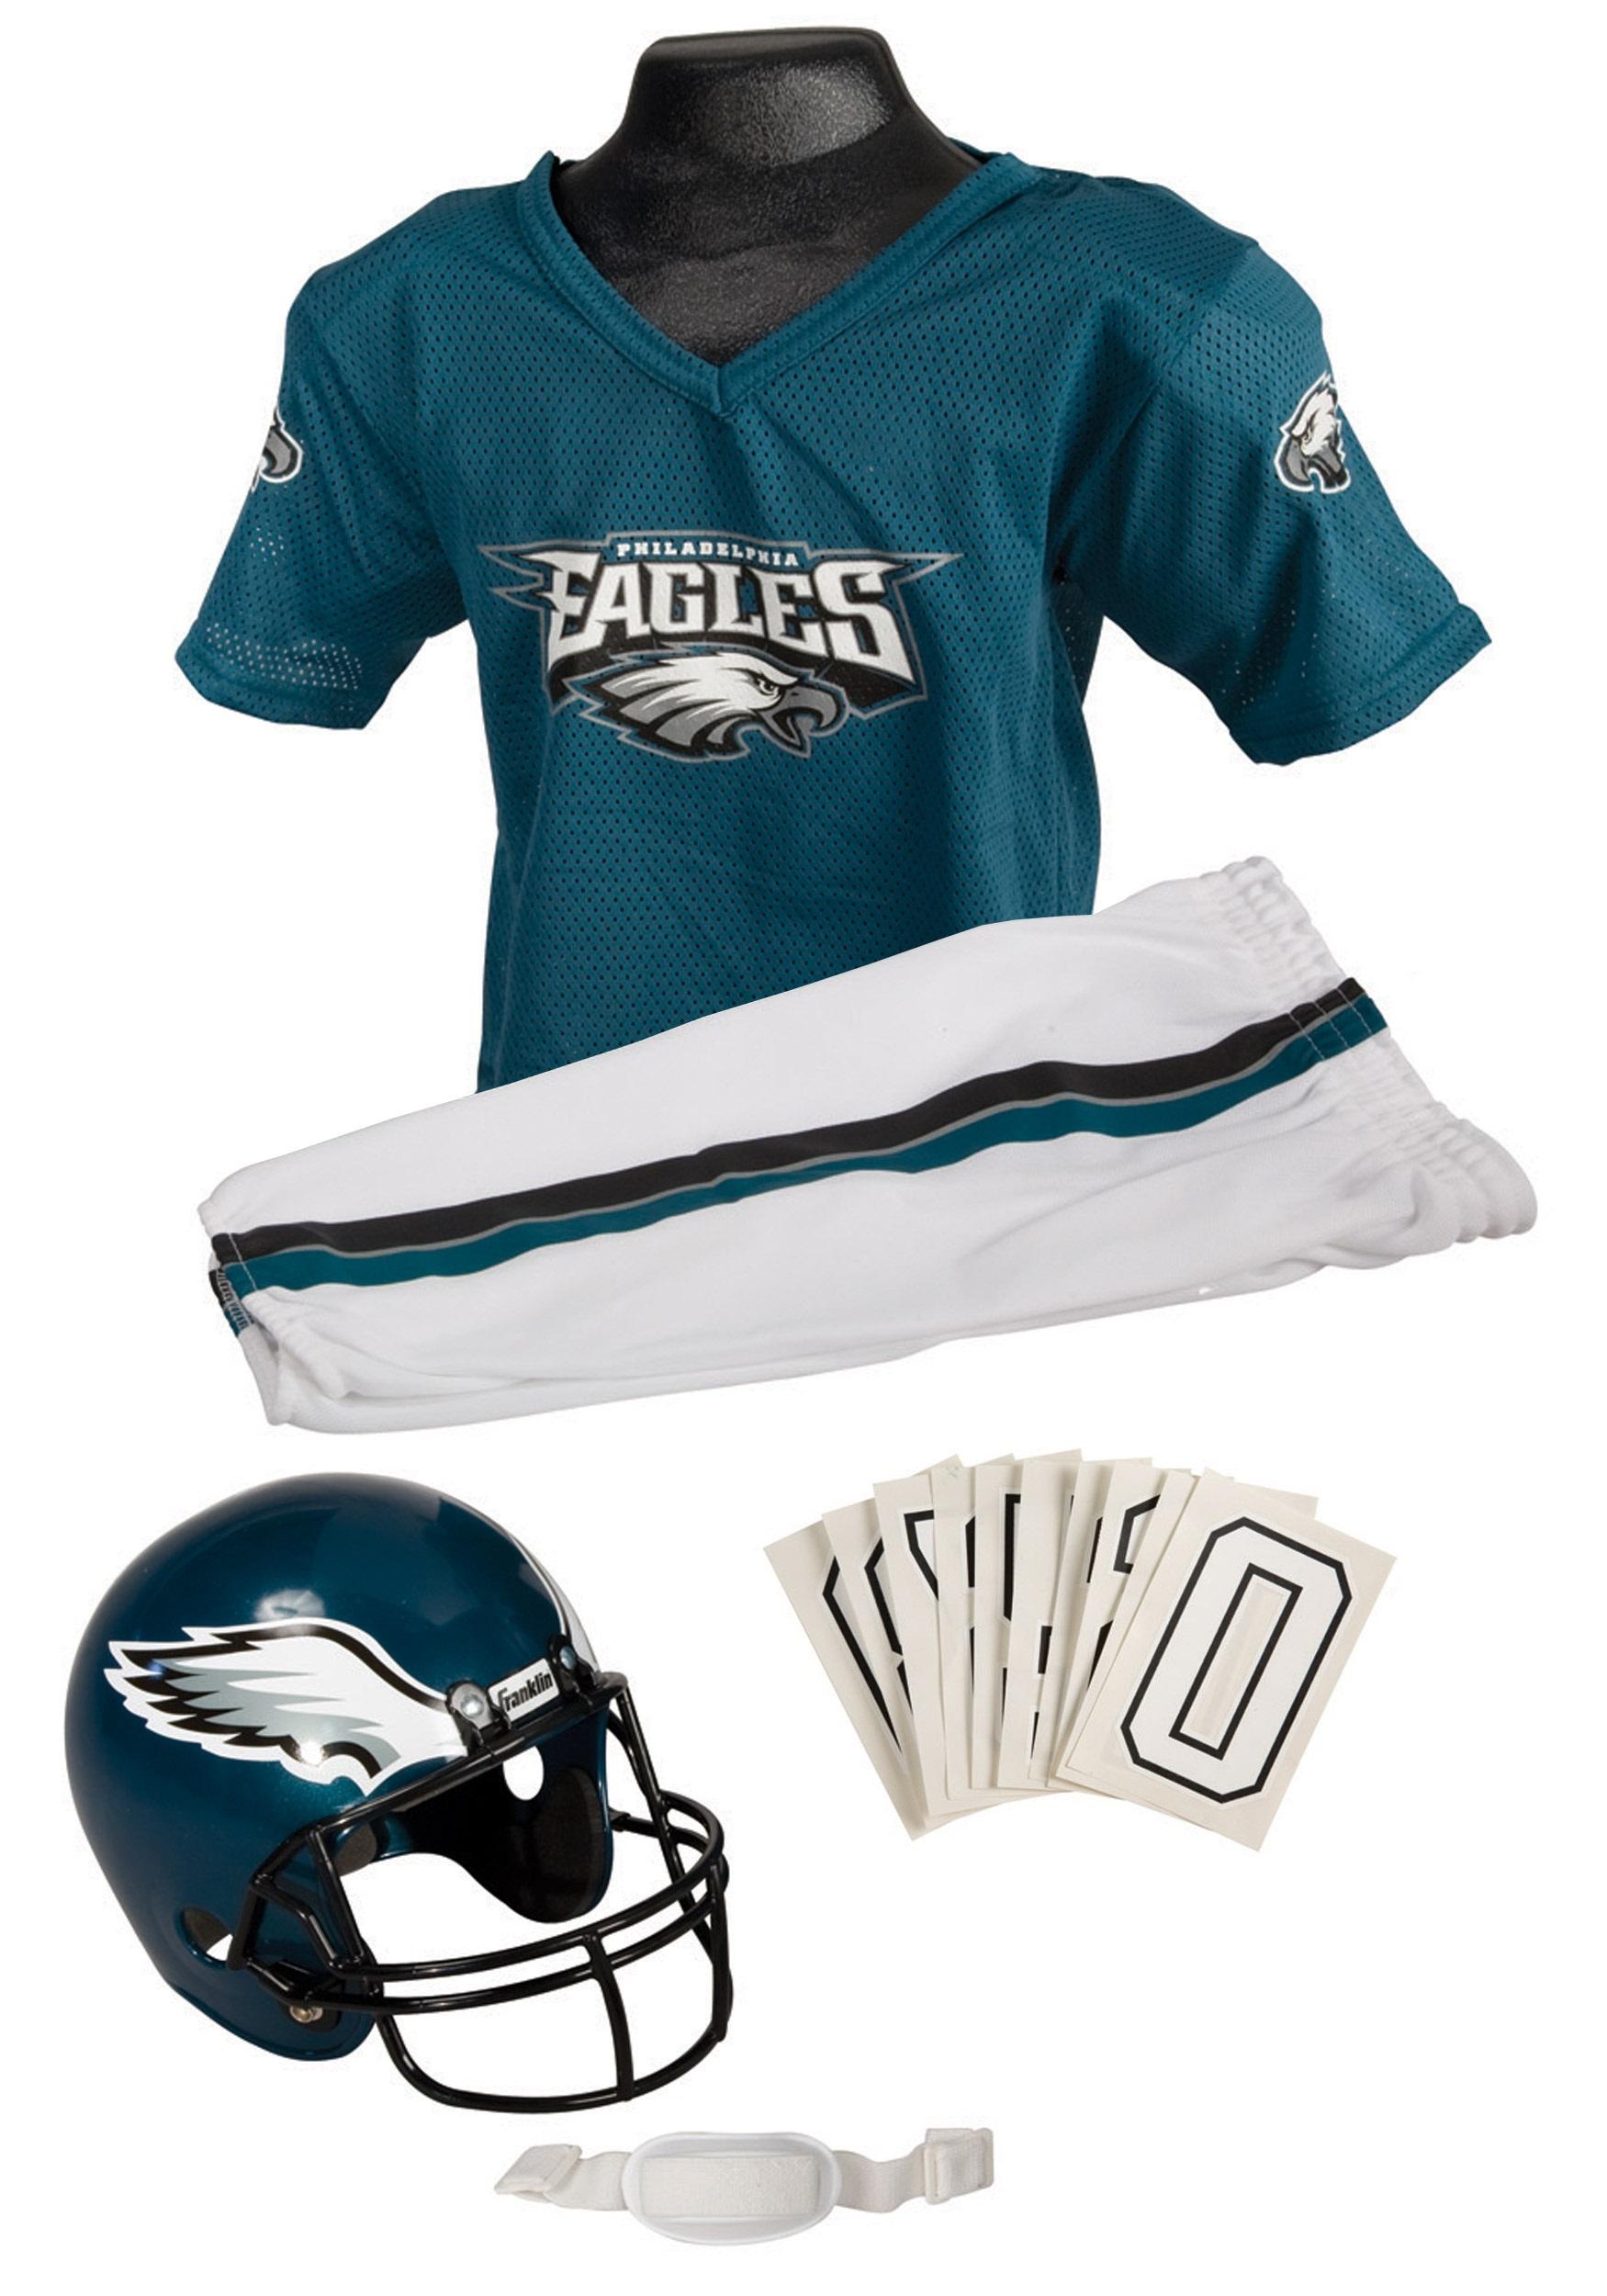 Boys NFL Eagles Uniform Costume  sc 1 st  Halloween Costume & Boys NFL Eagles Uniform Costume - Philadelphia Eagles Football Costume